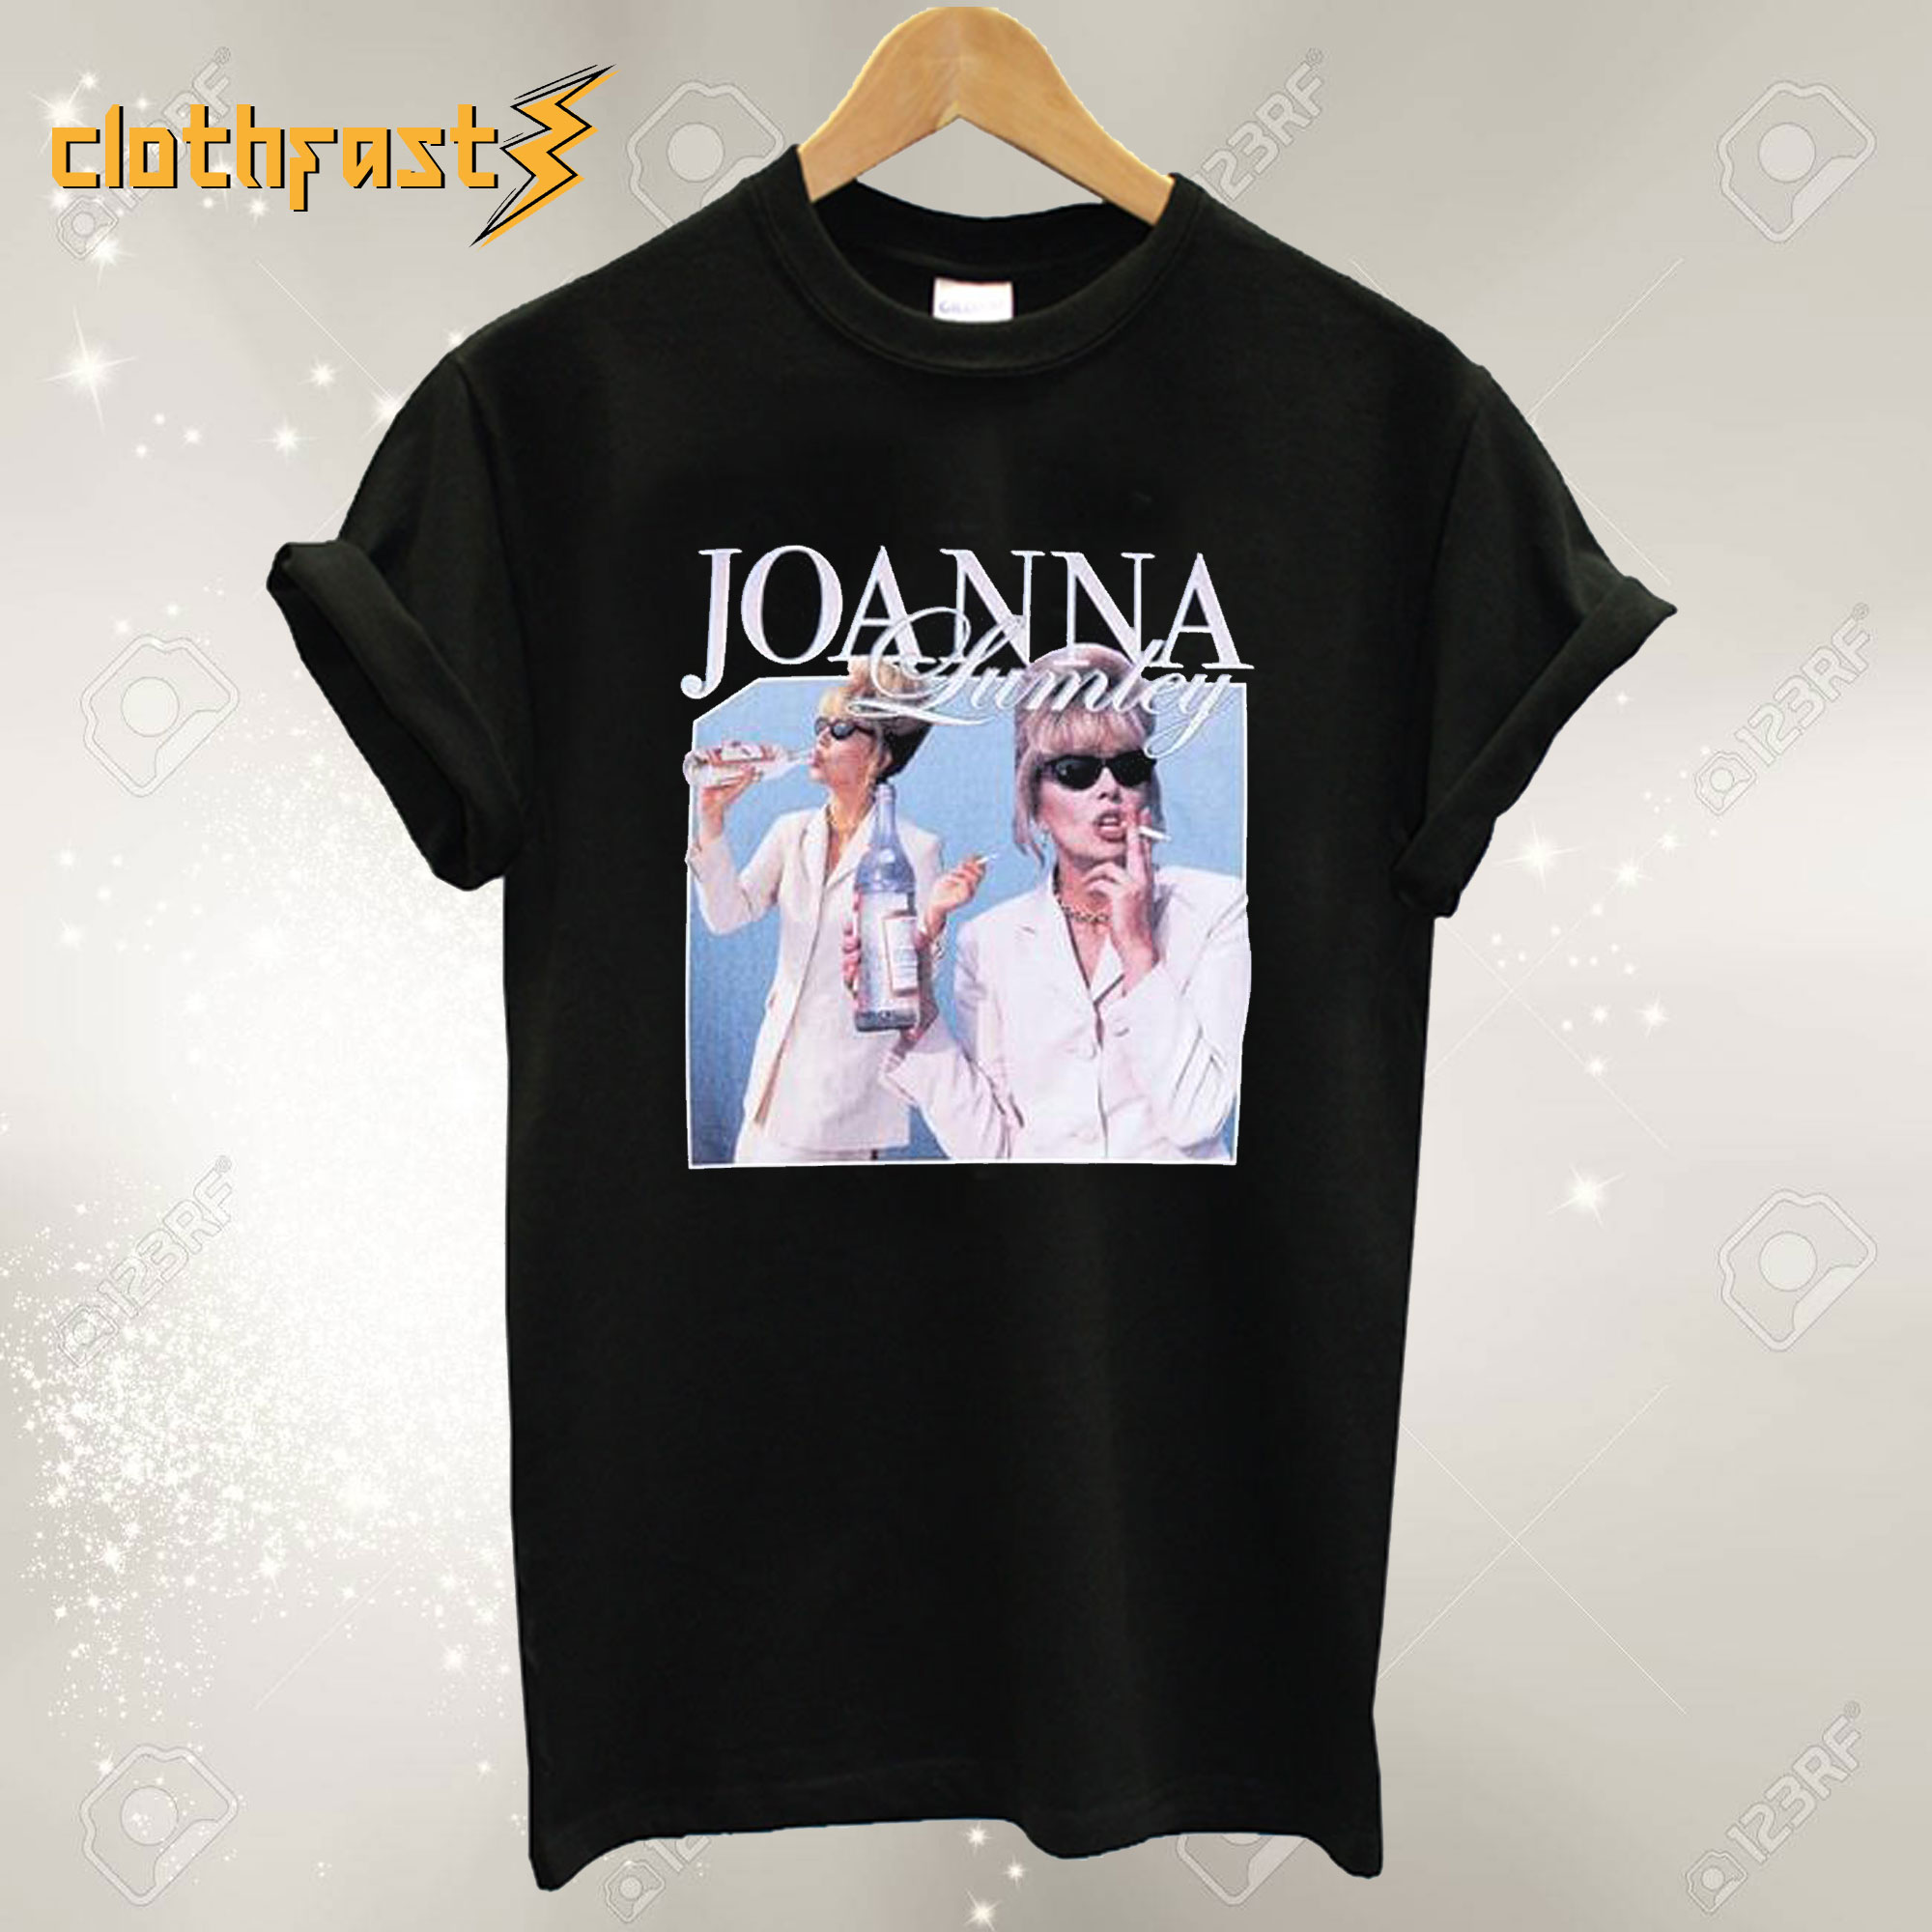 Joanna Lumley T-Shirt